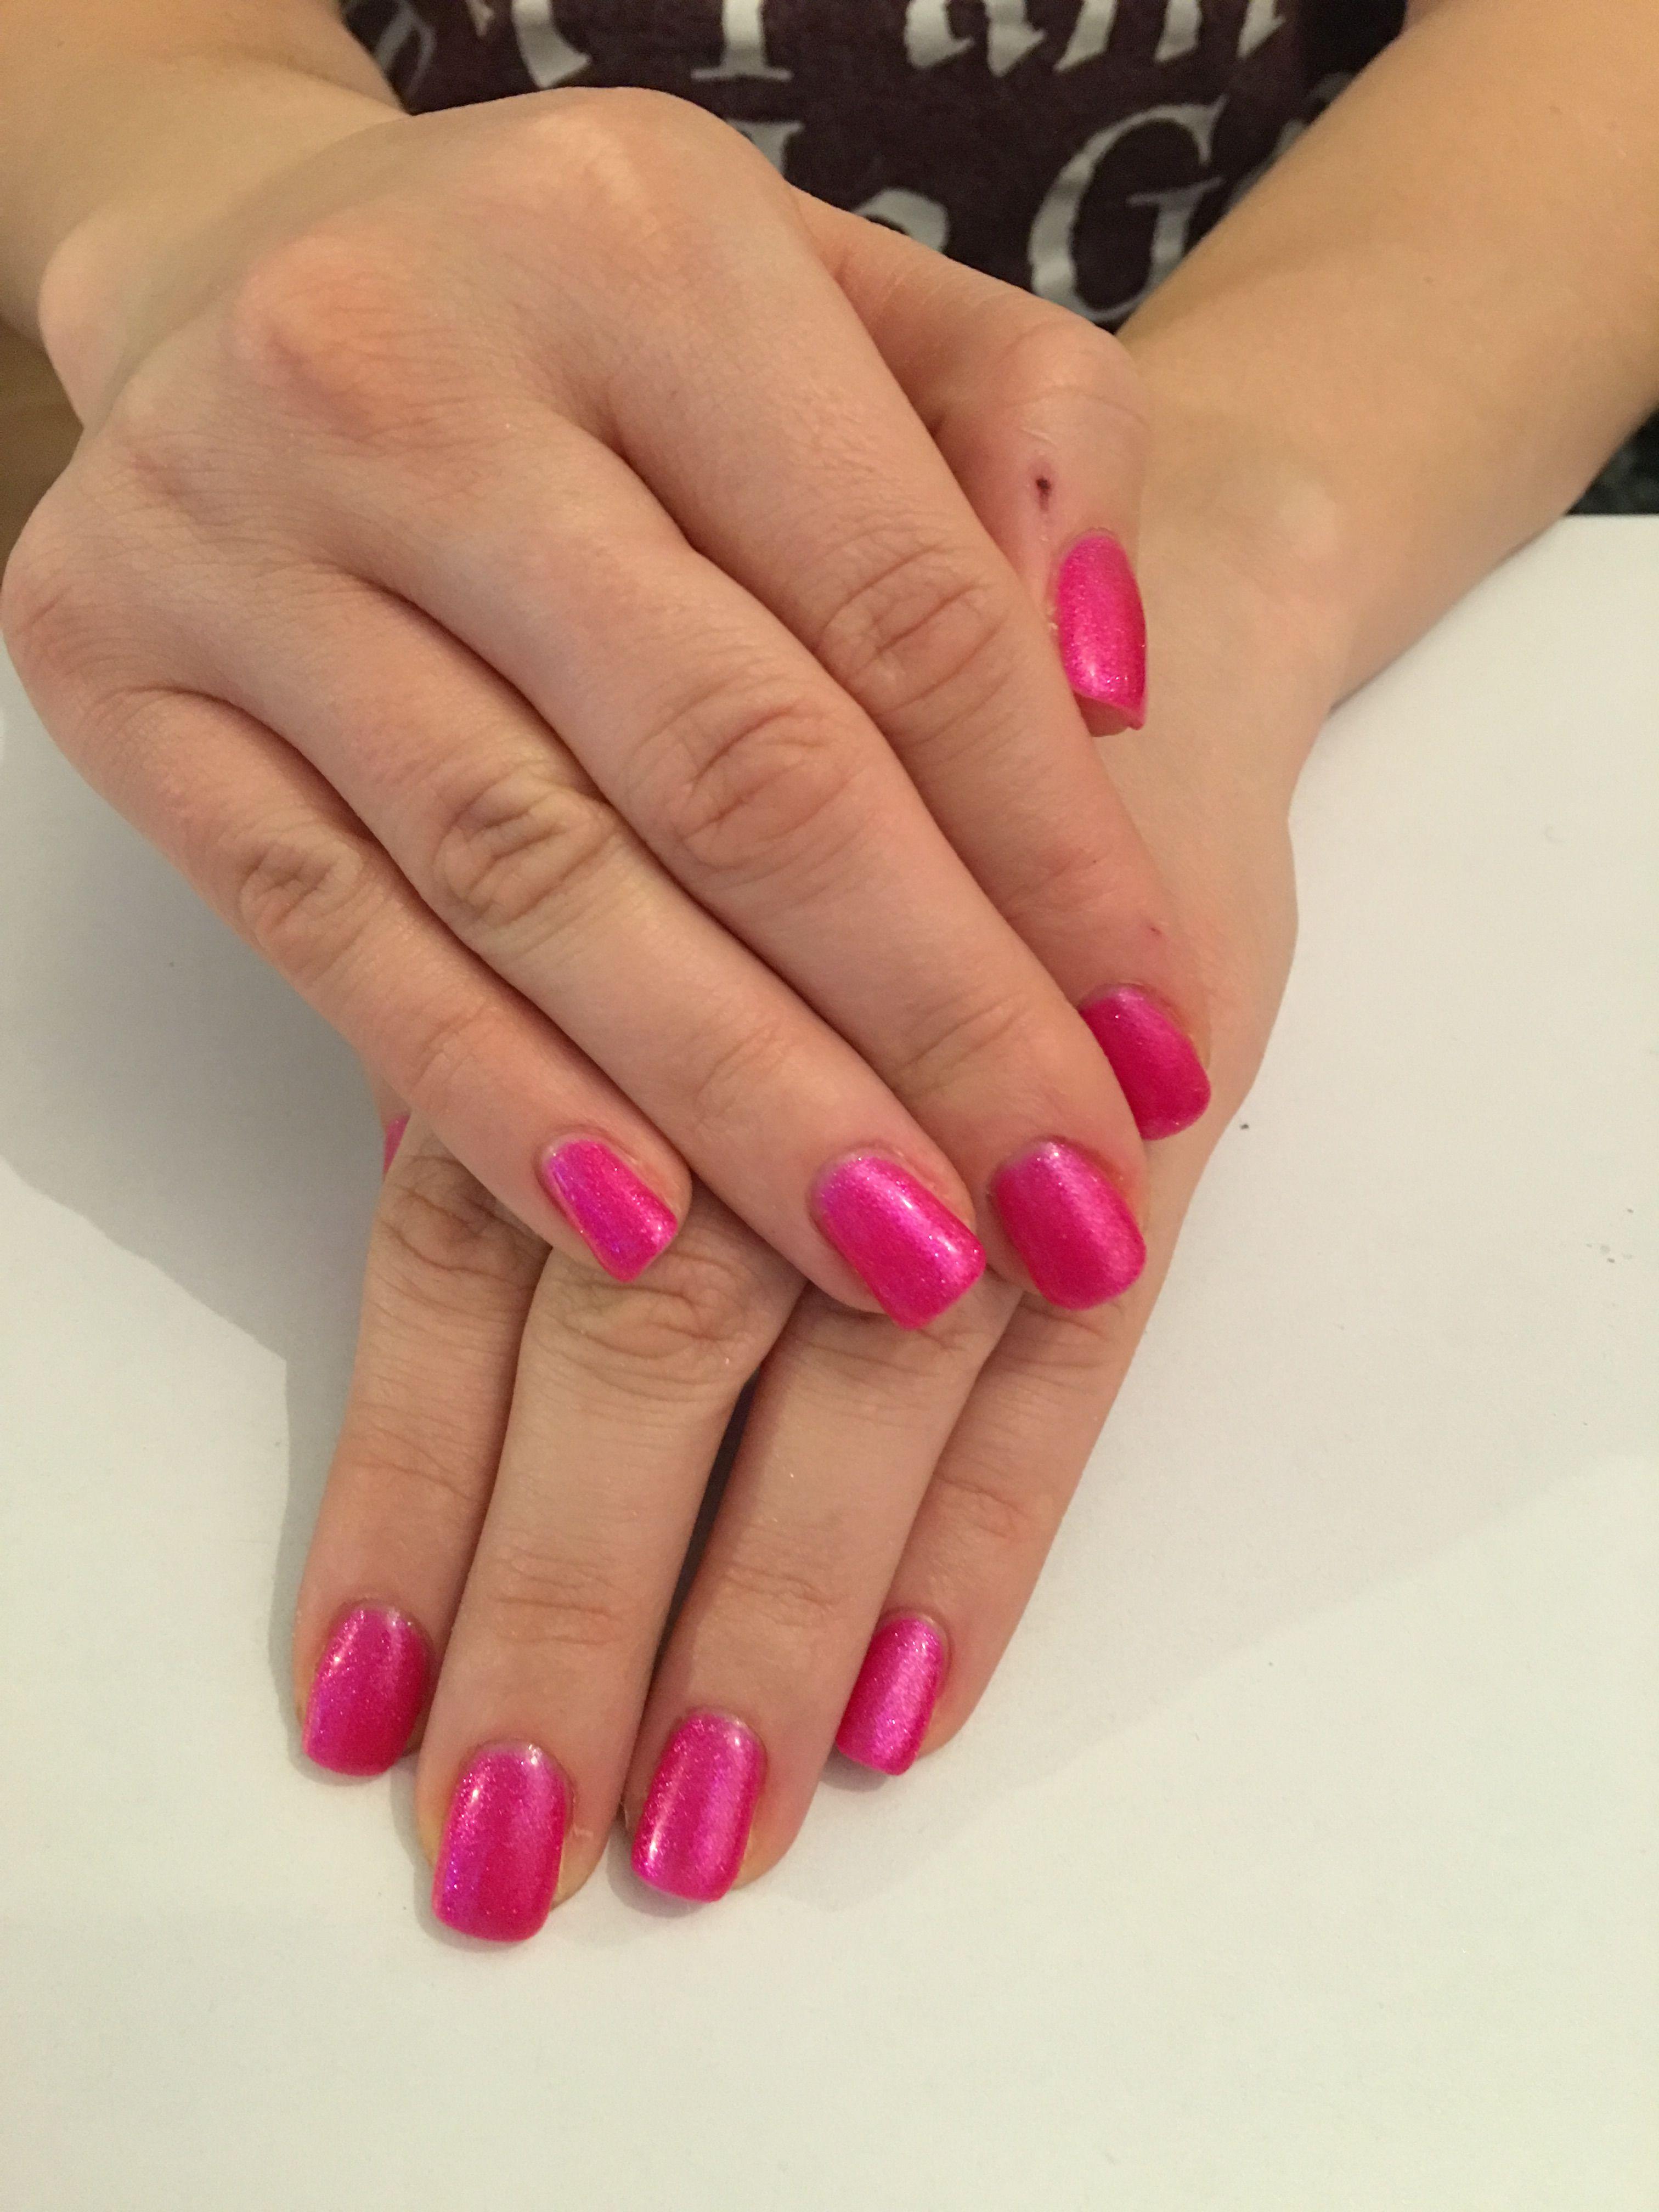 Pin By Poppy Joyner Buchanan On Jessica Geleration Manicures